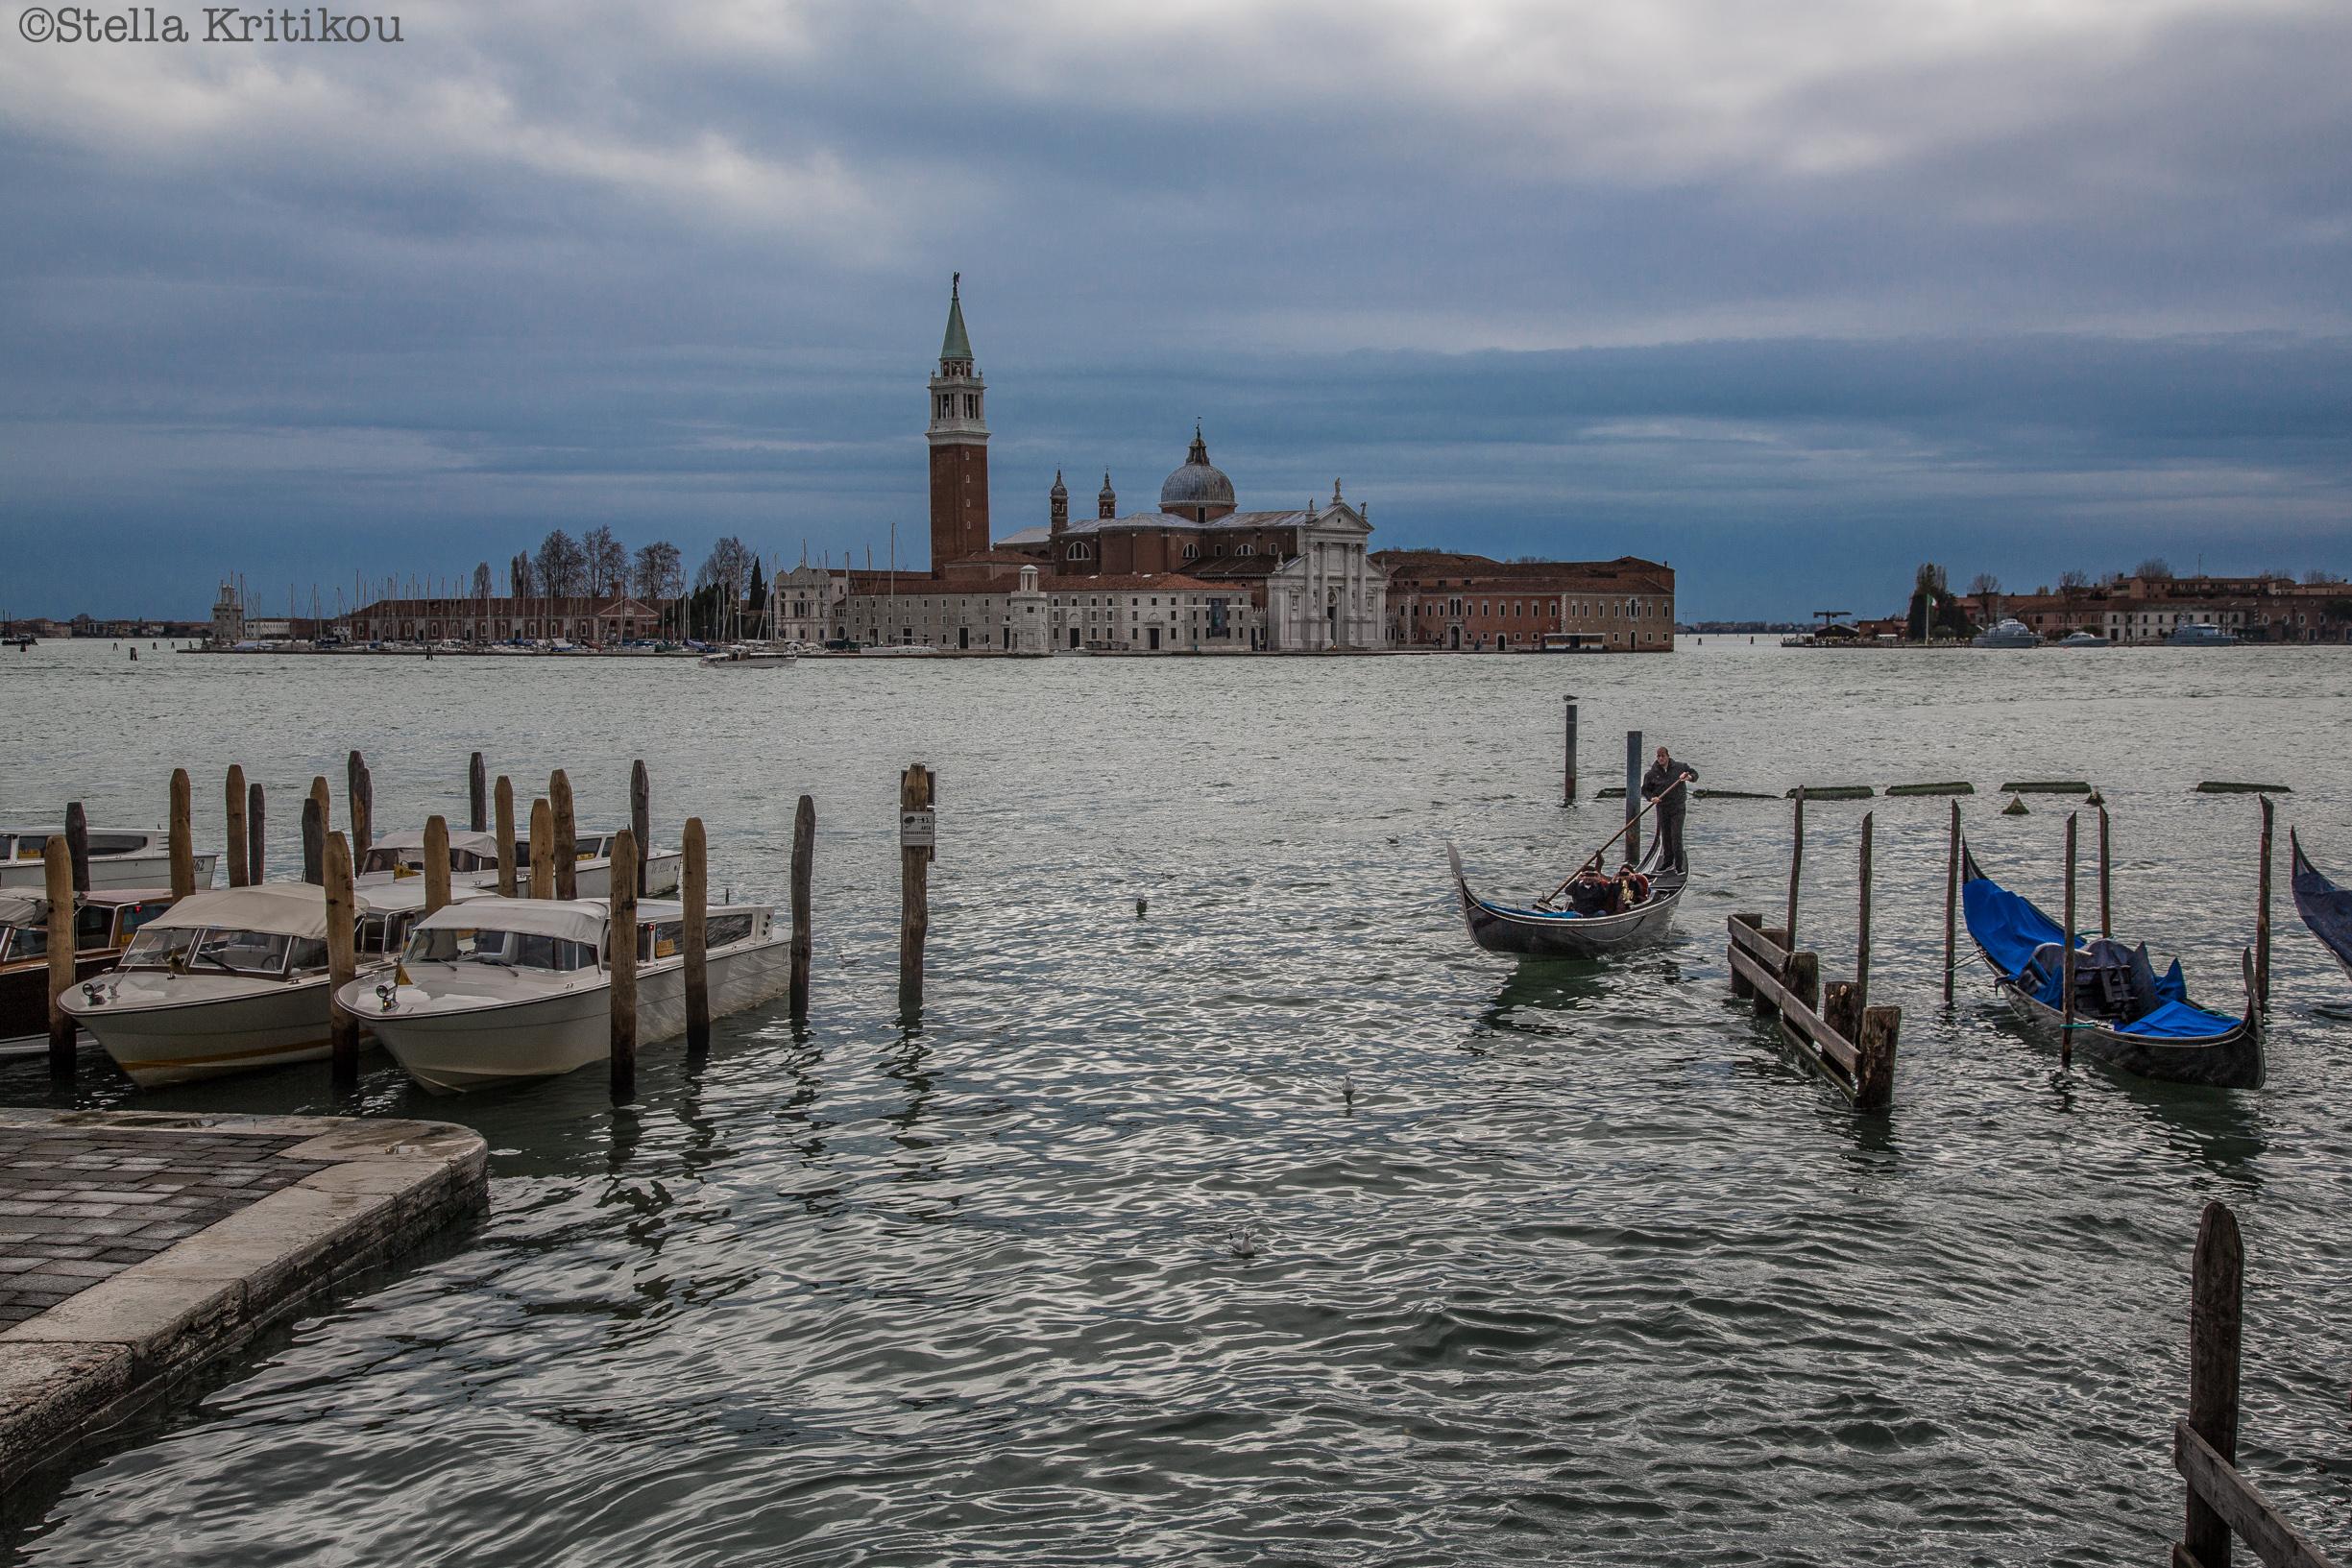 Stella Kritikou Venice 2014.jpg